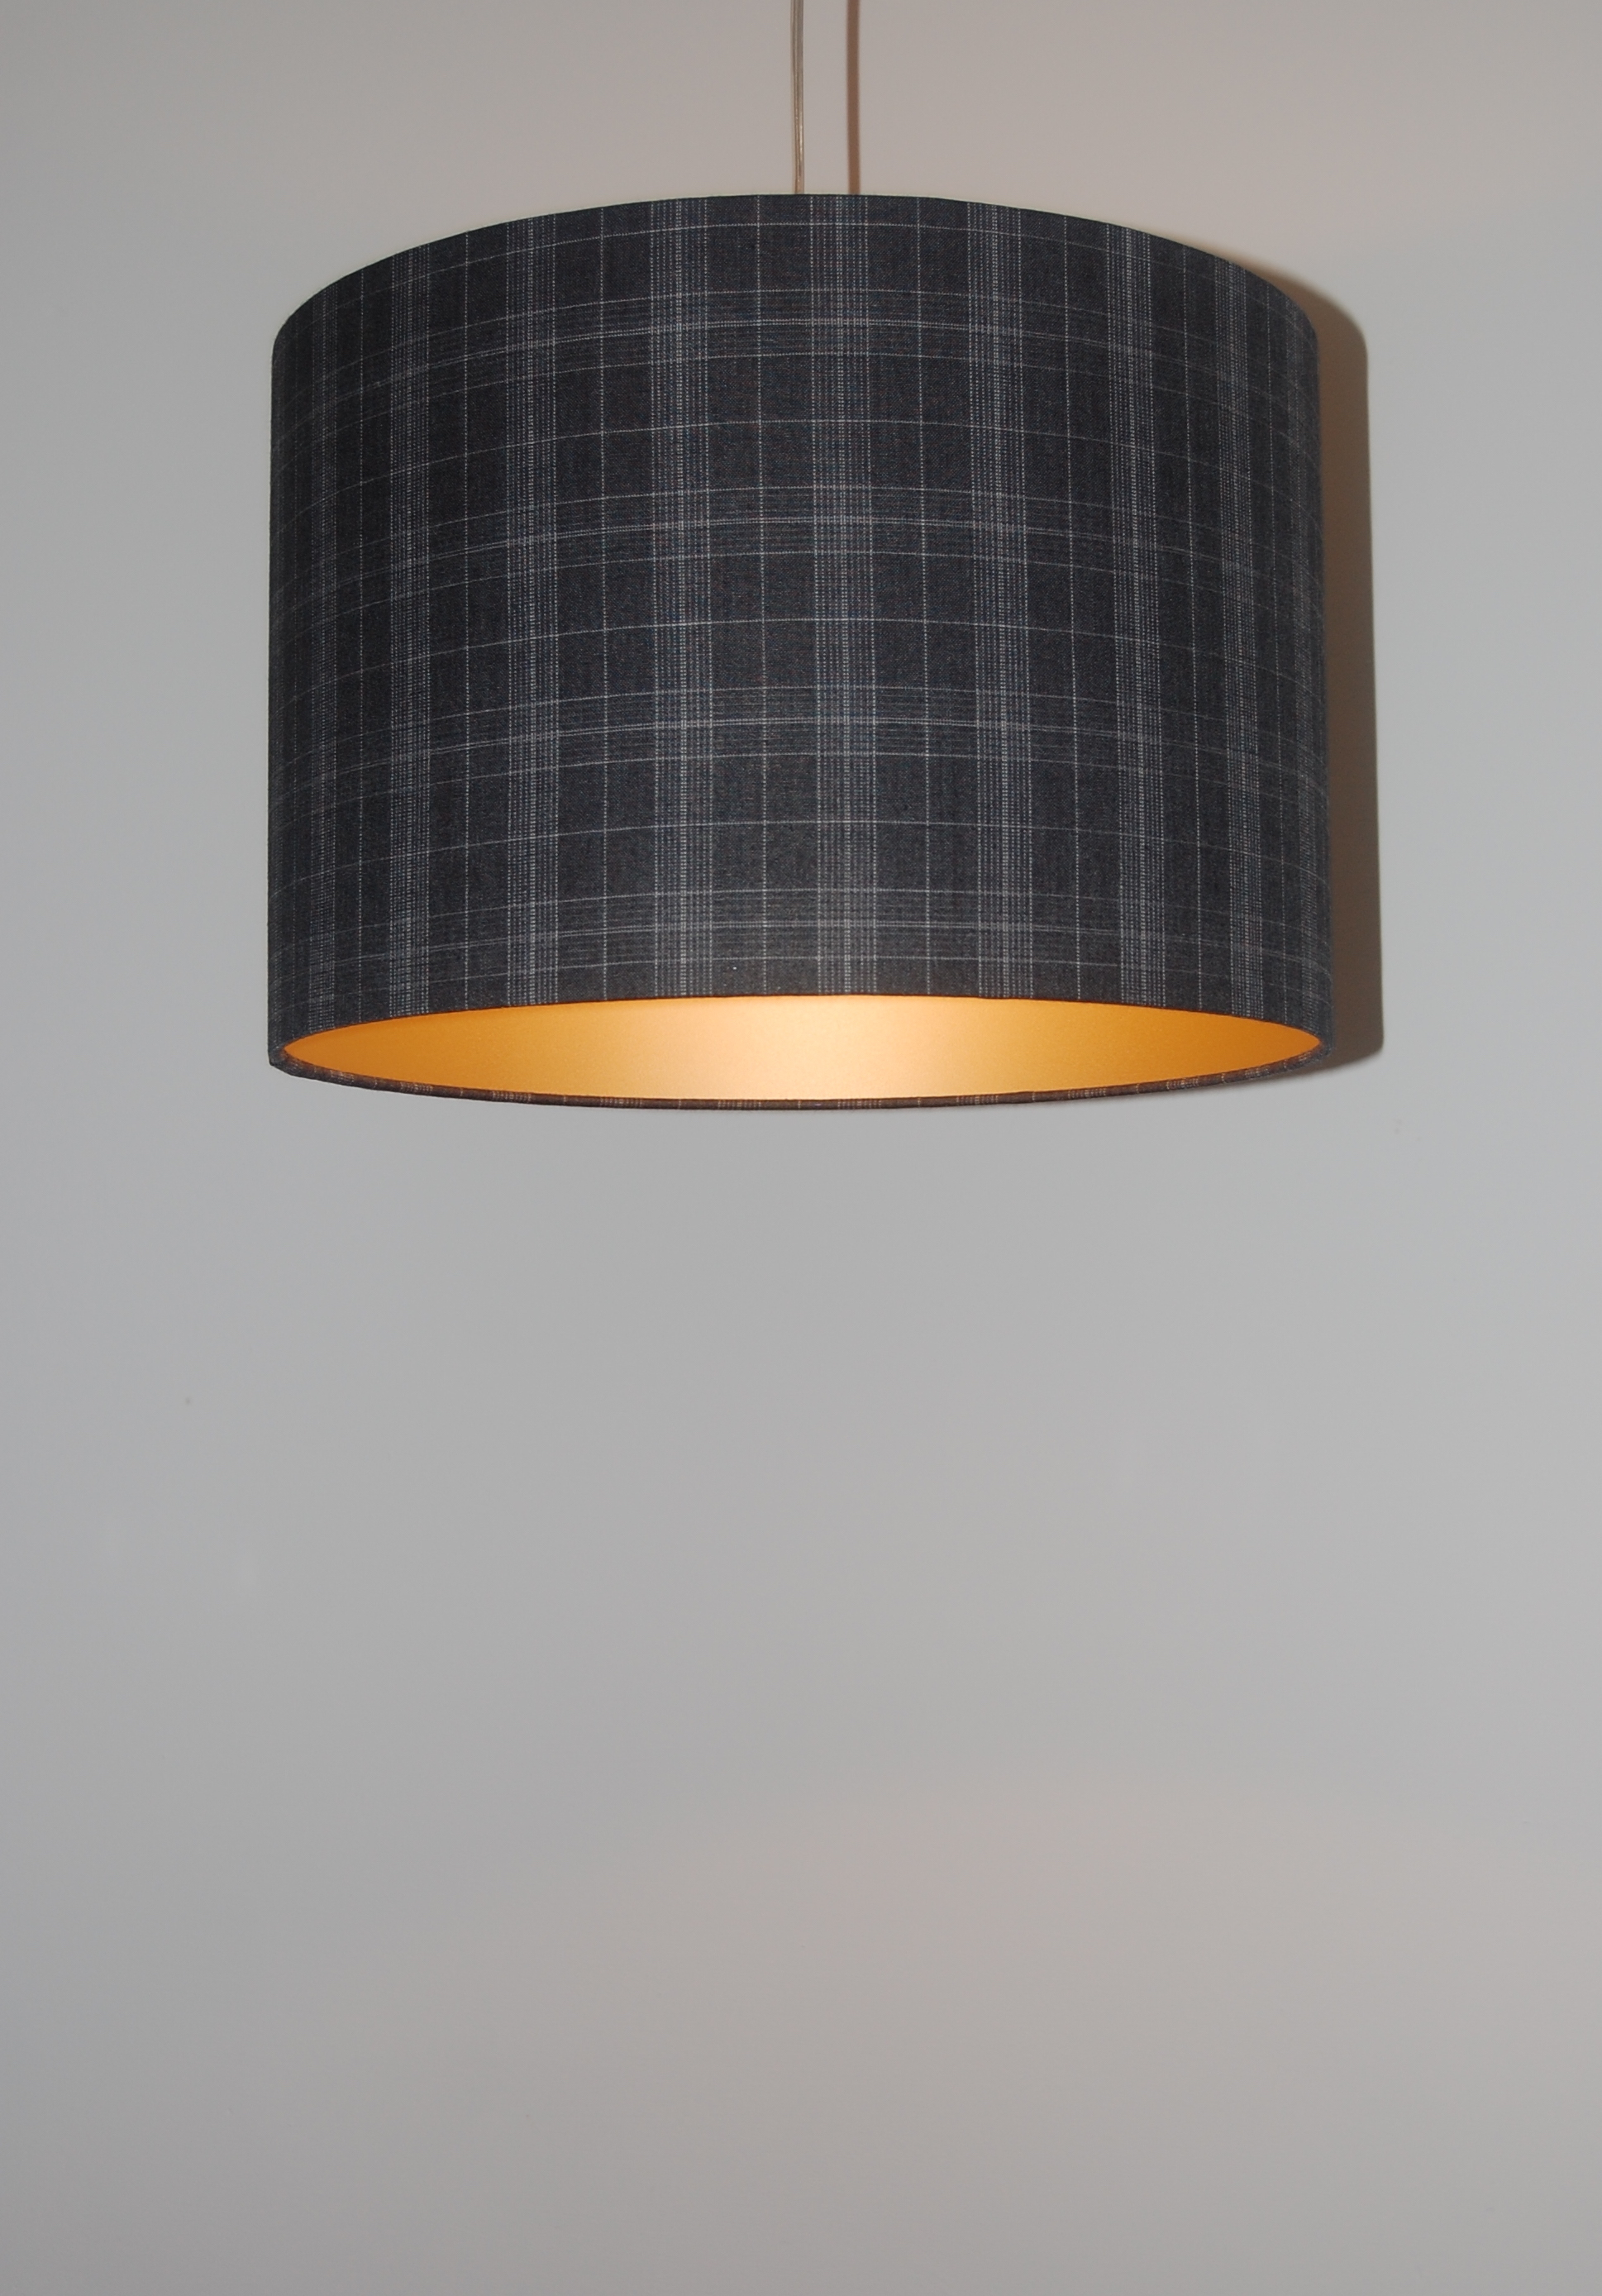 Tartan lamp shades